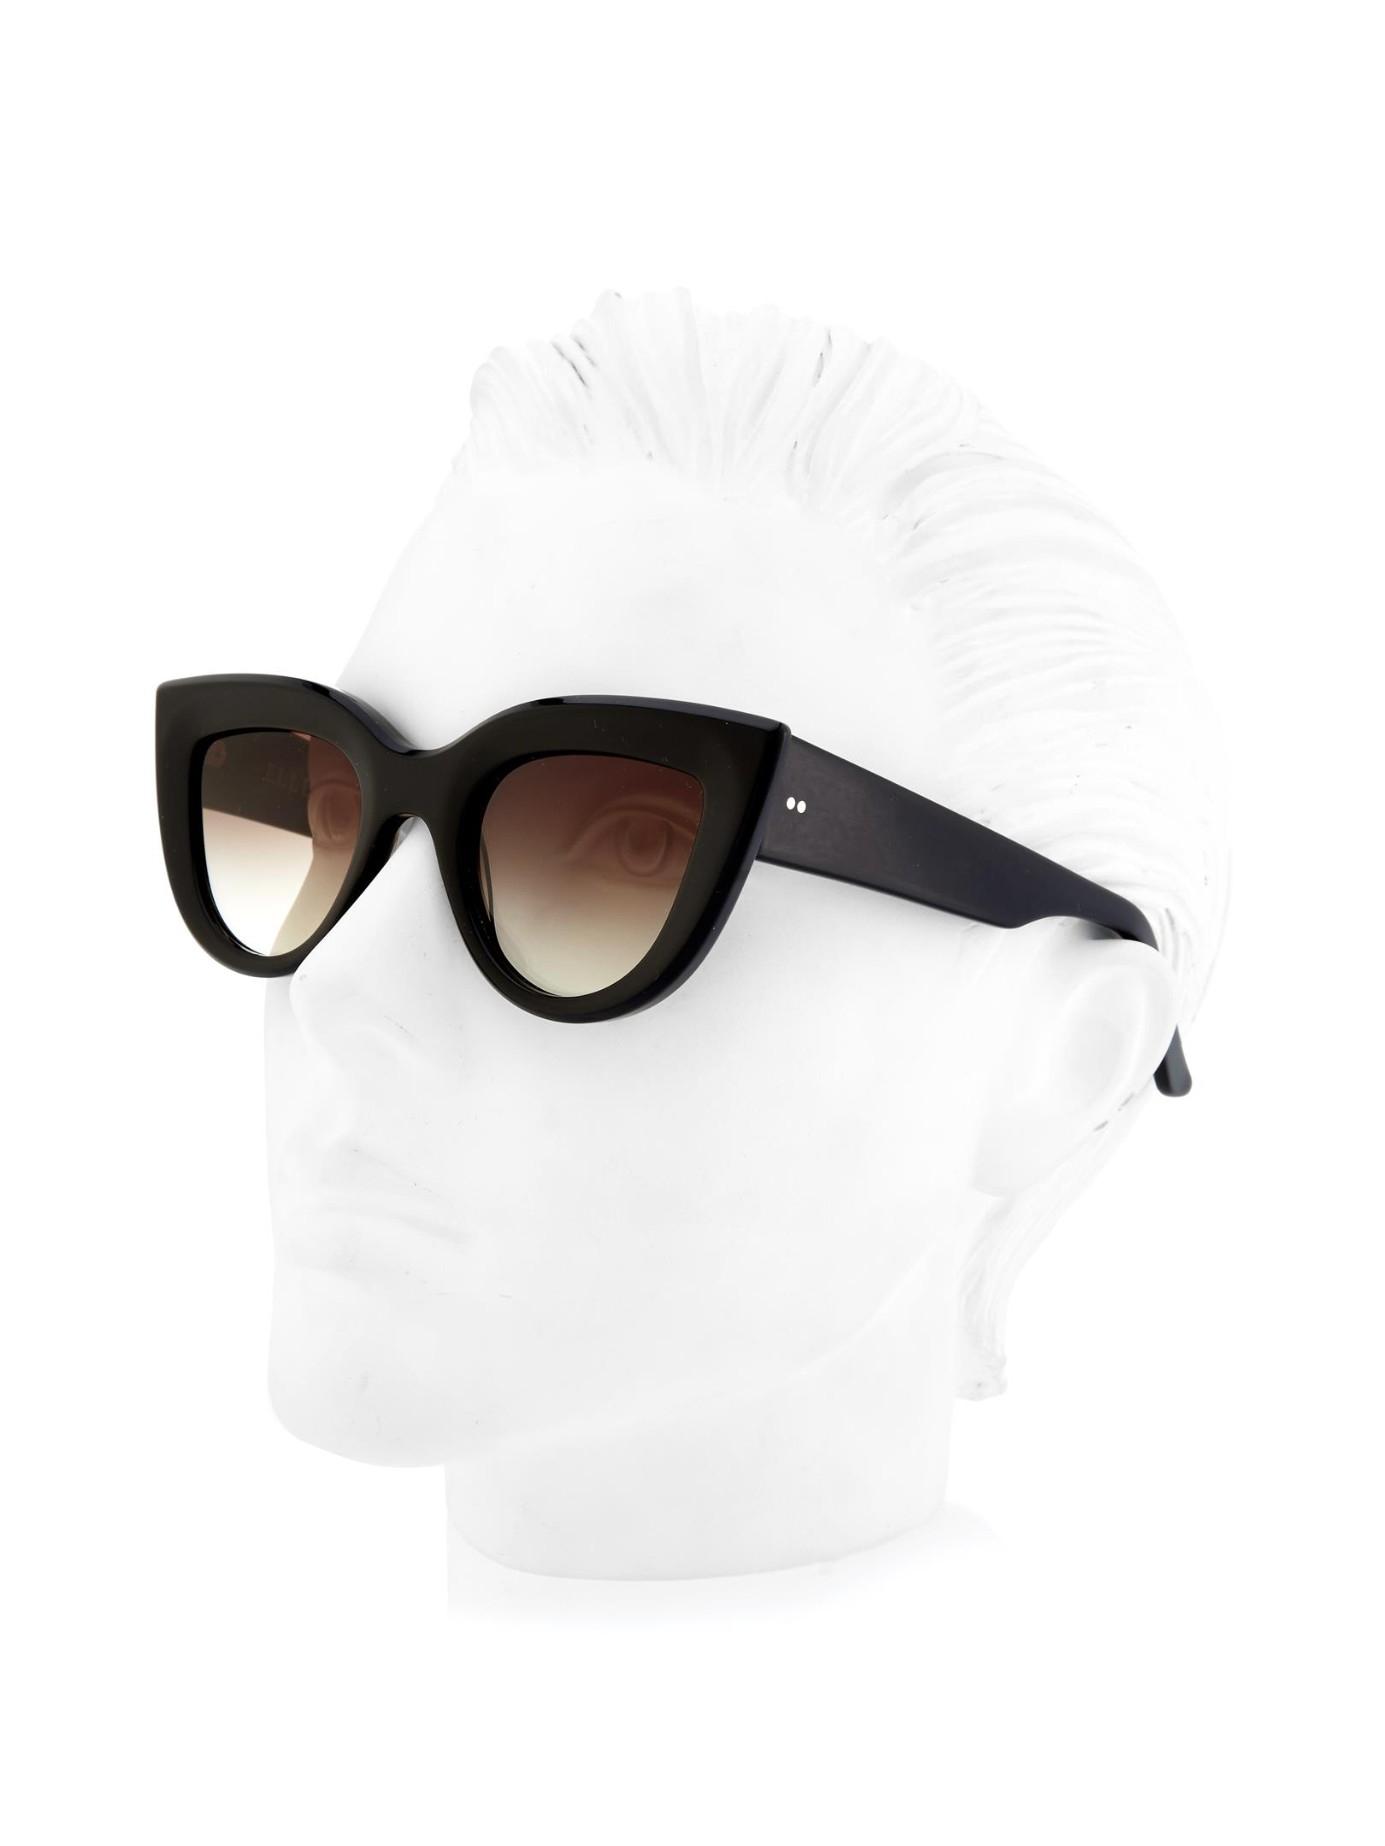 ecb8be5e16 Ellery Quixote Cat-Eye Sunglasses in Black - Lyst